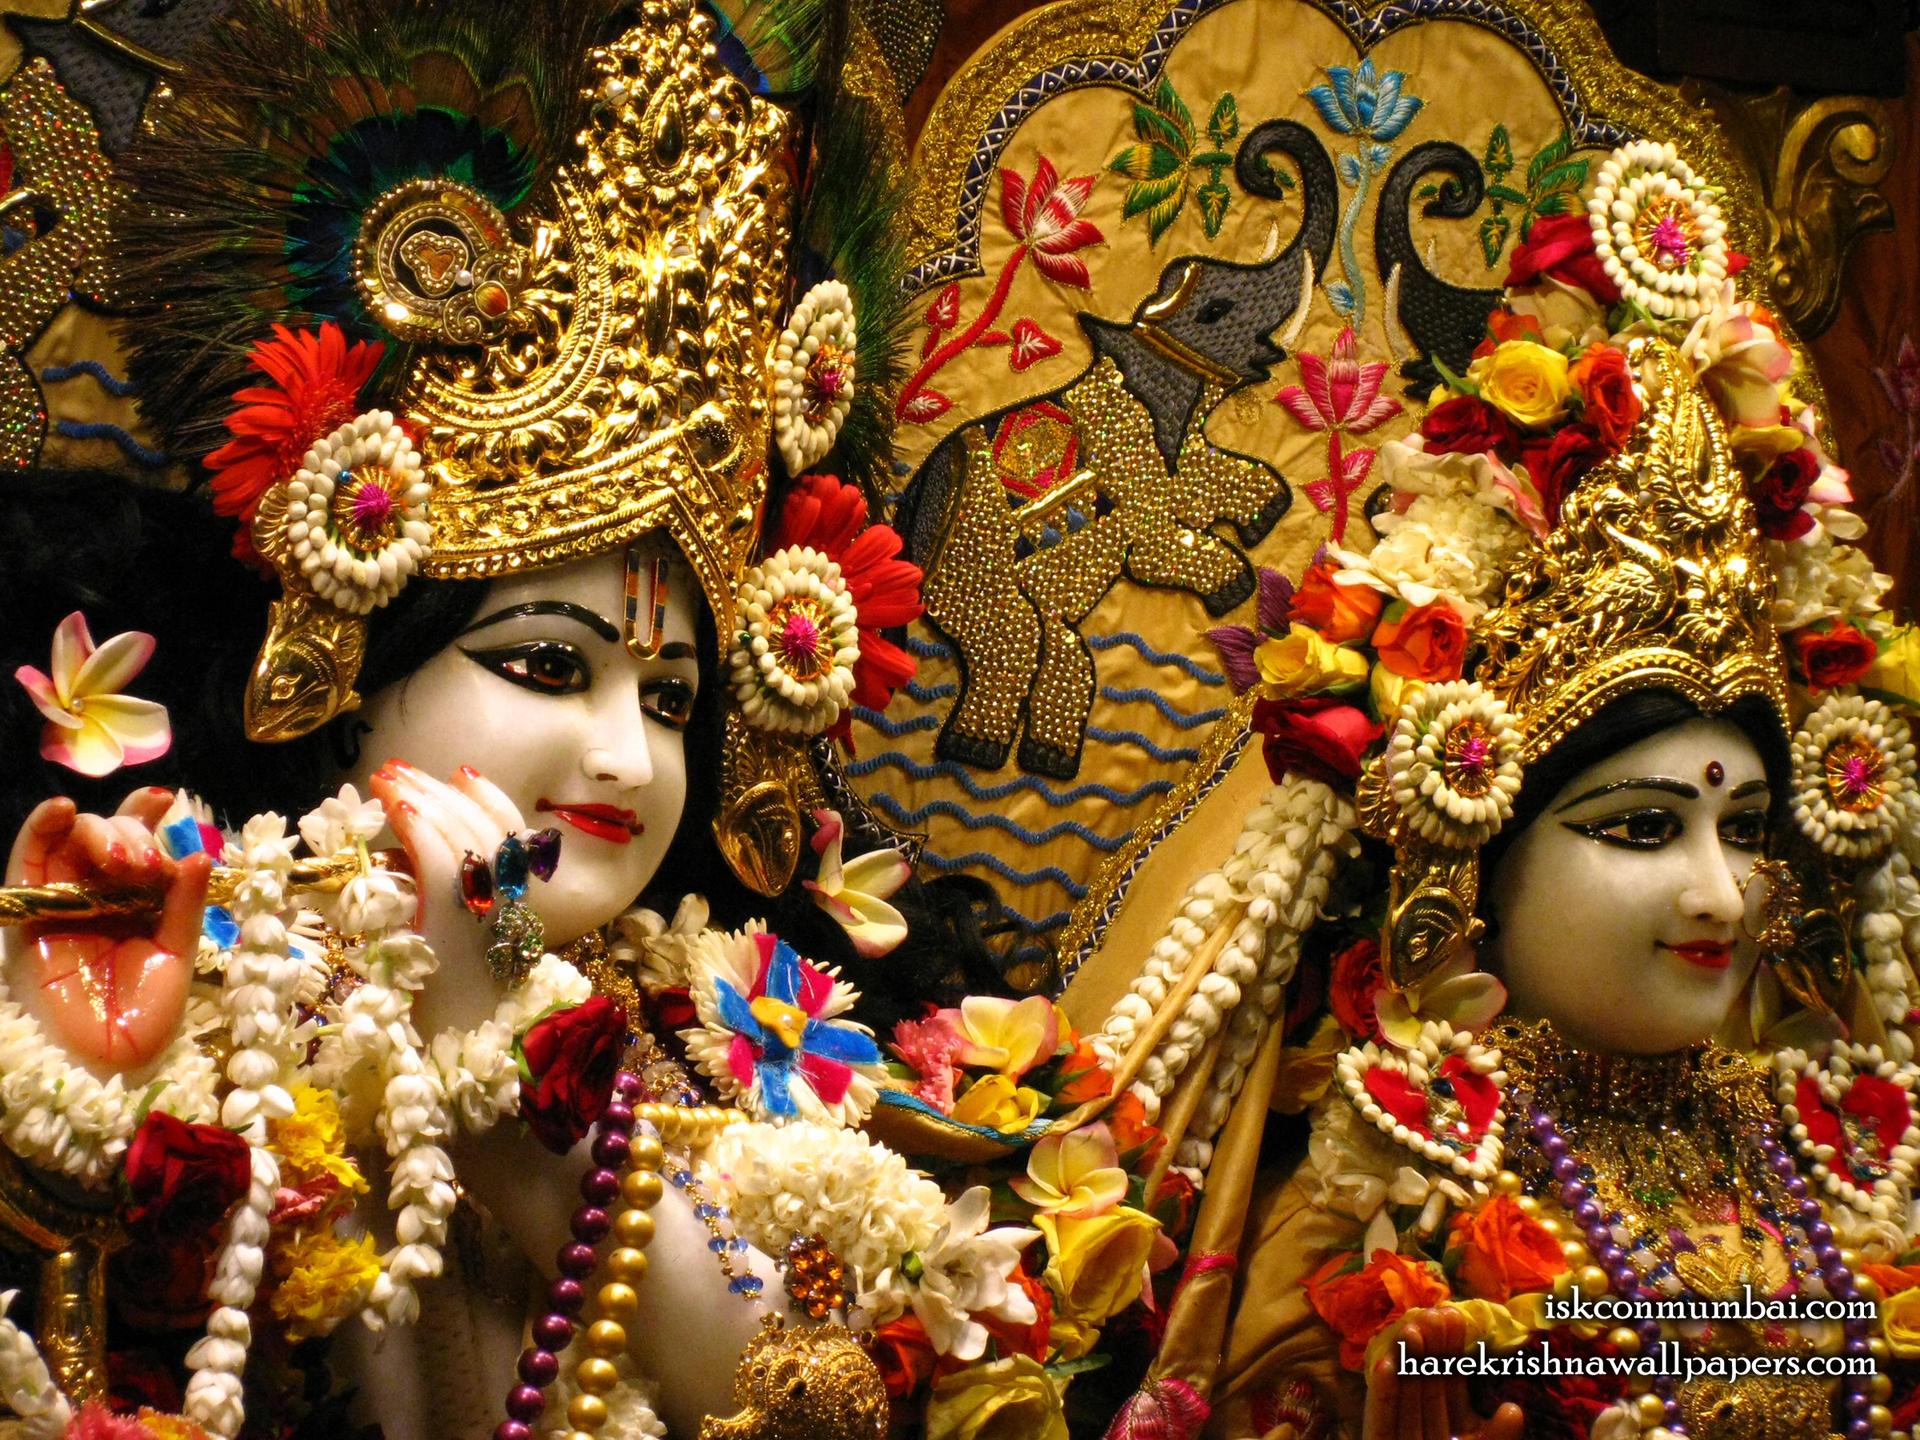 Sri Sri Radha Rasabihari Close up Wallpaper (028) Size 1920x1440 Download